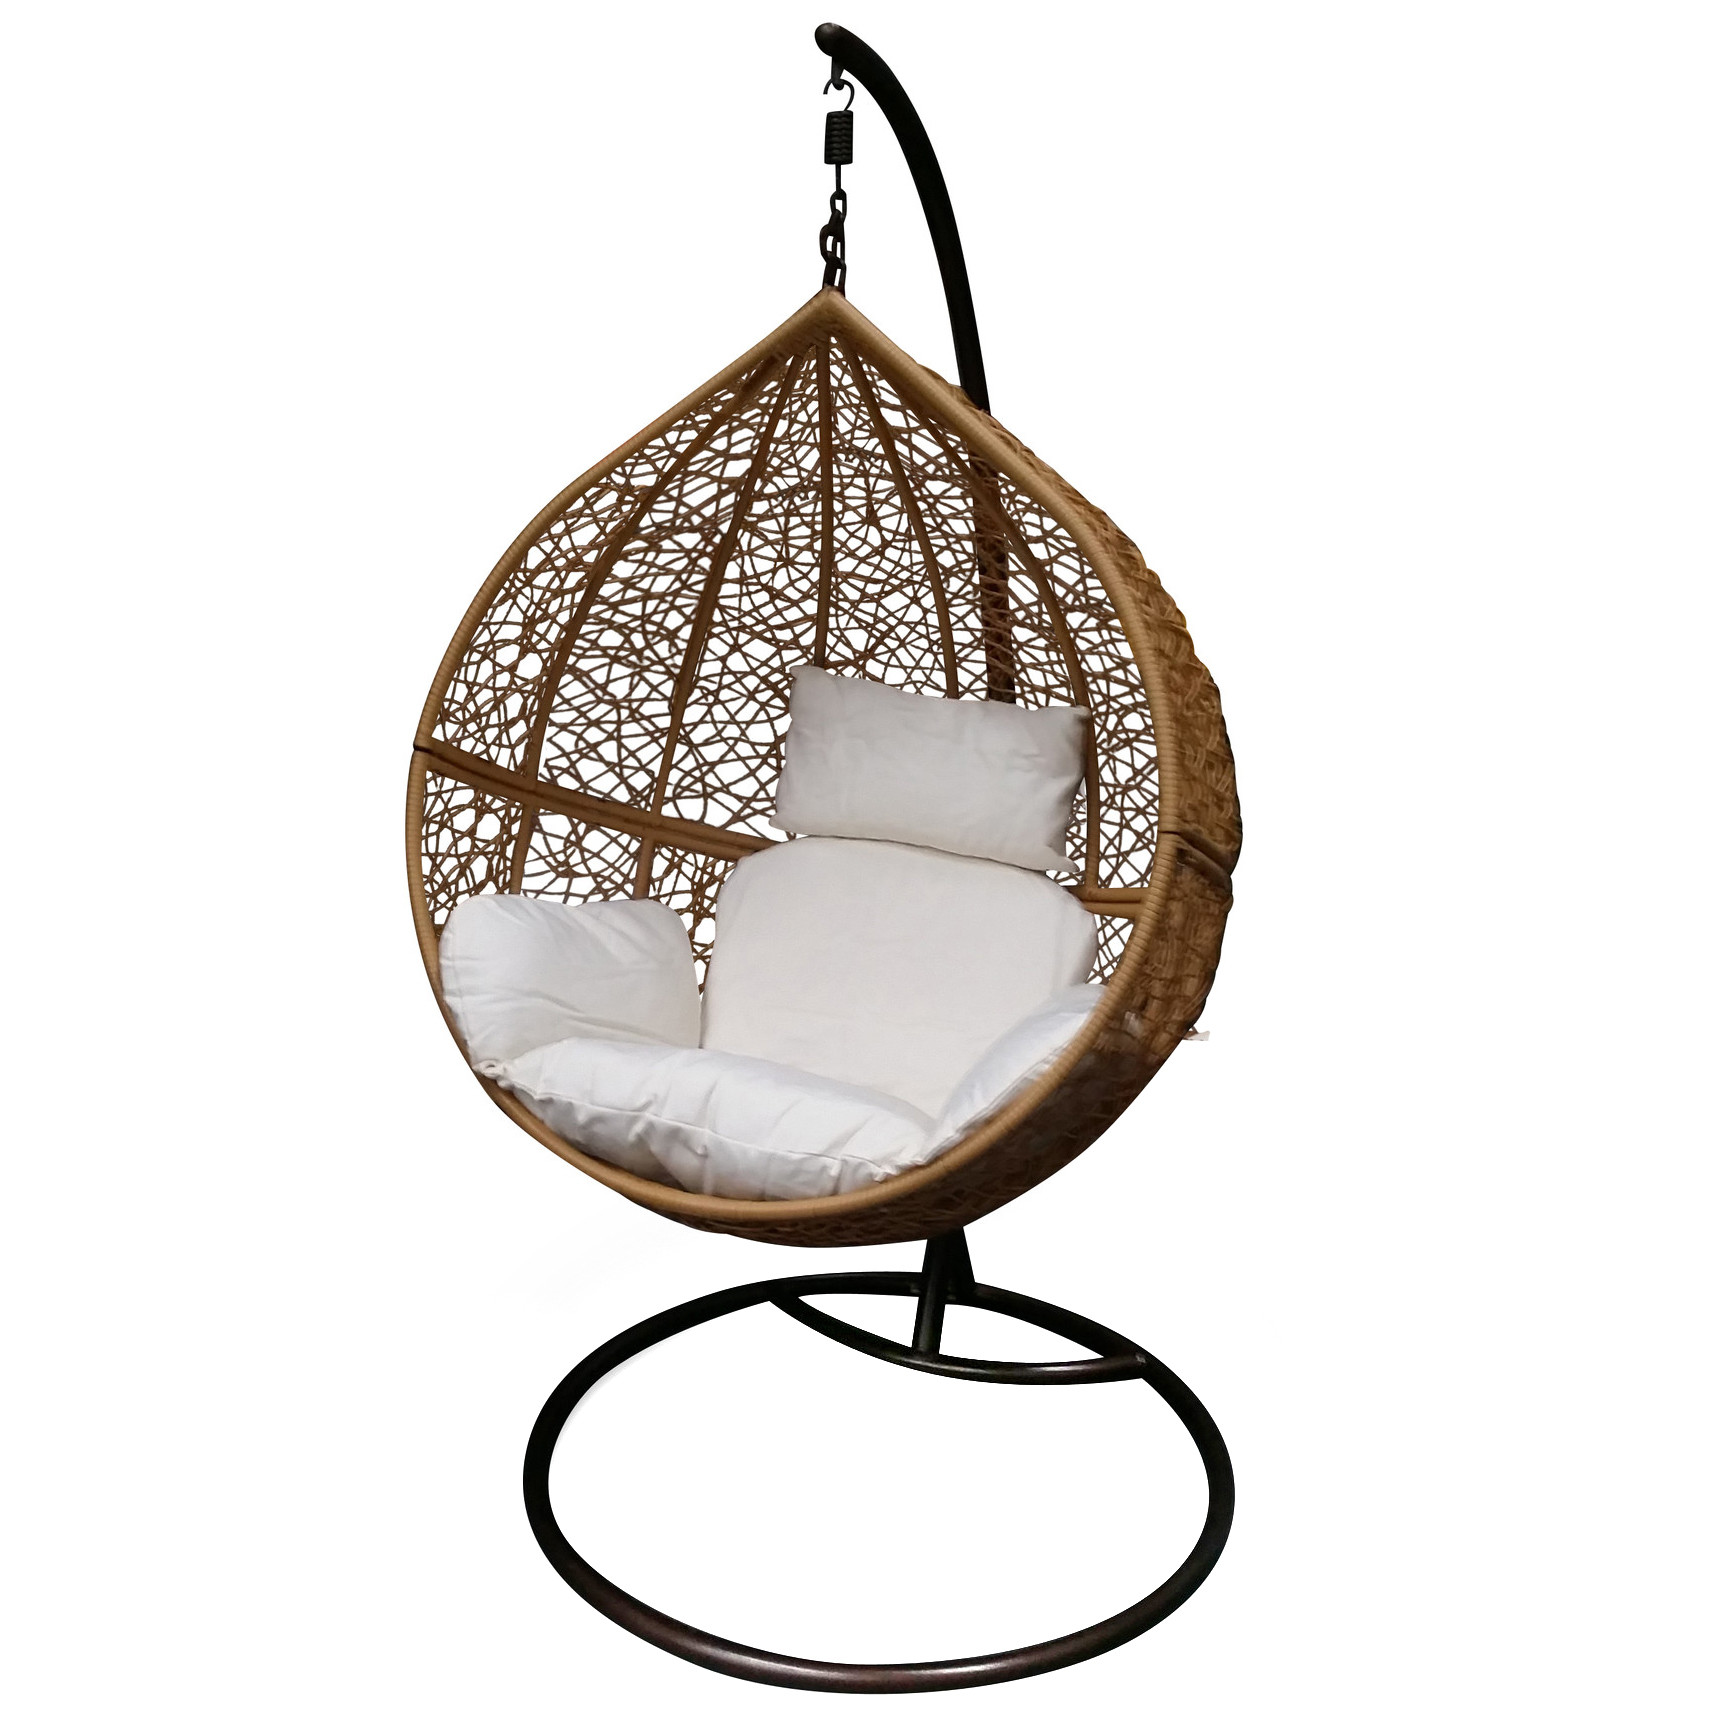 Light Brown Hanging Ball Chair